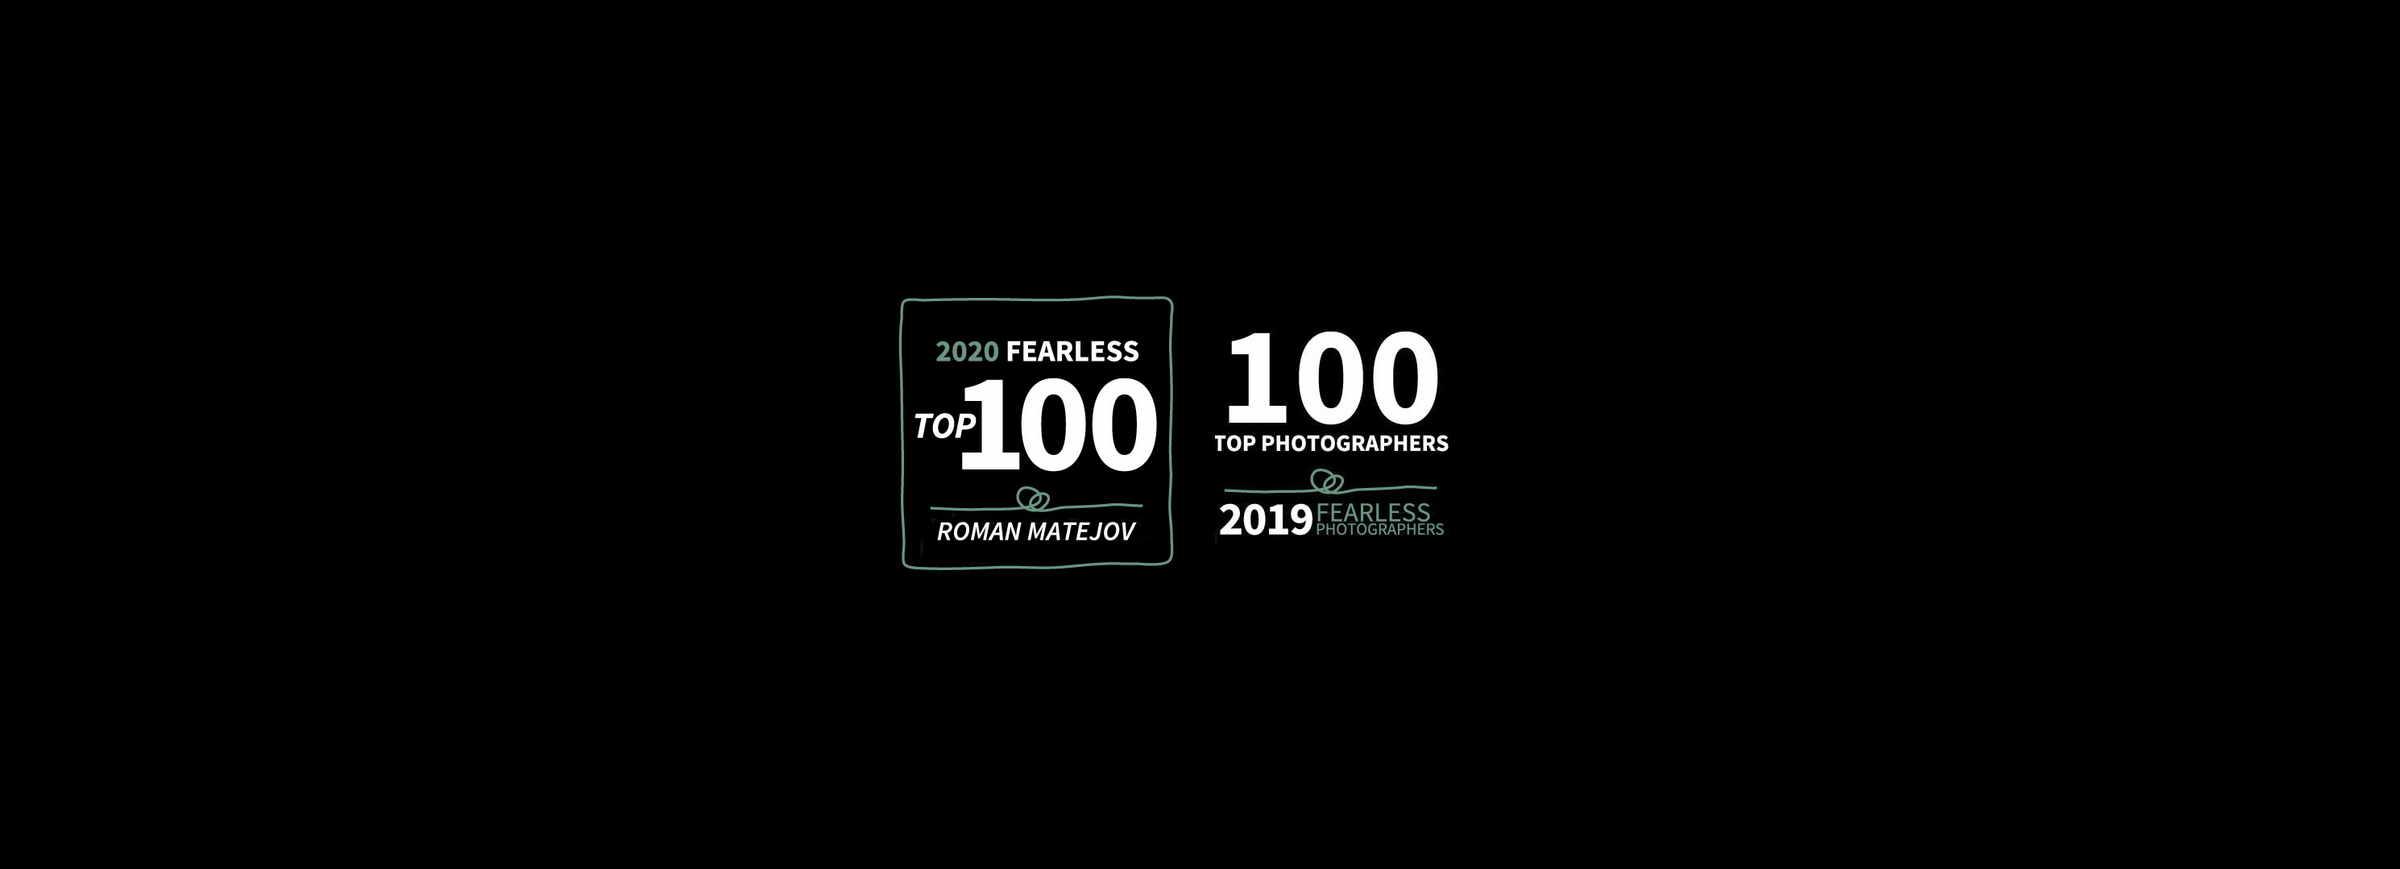 Fearless Top 100 Fotograf